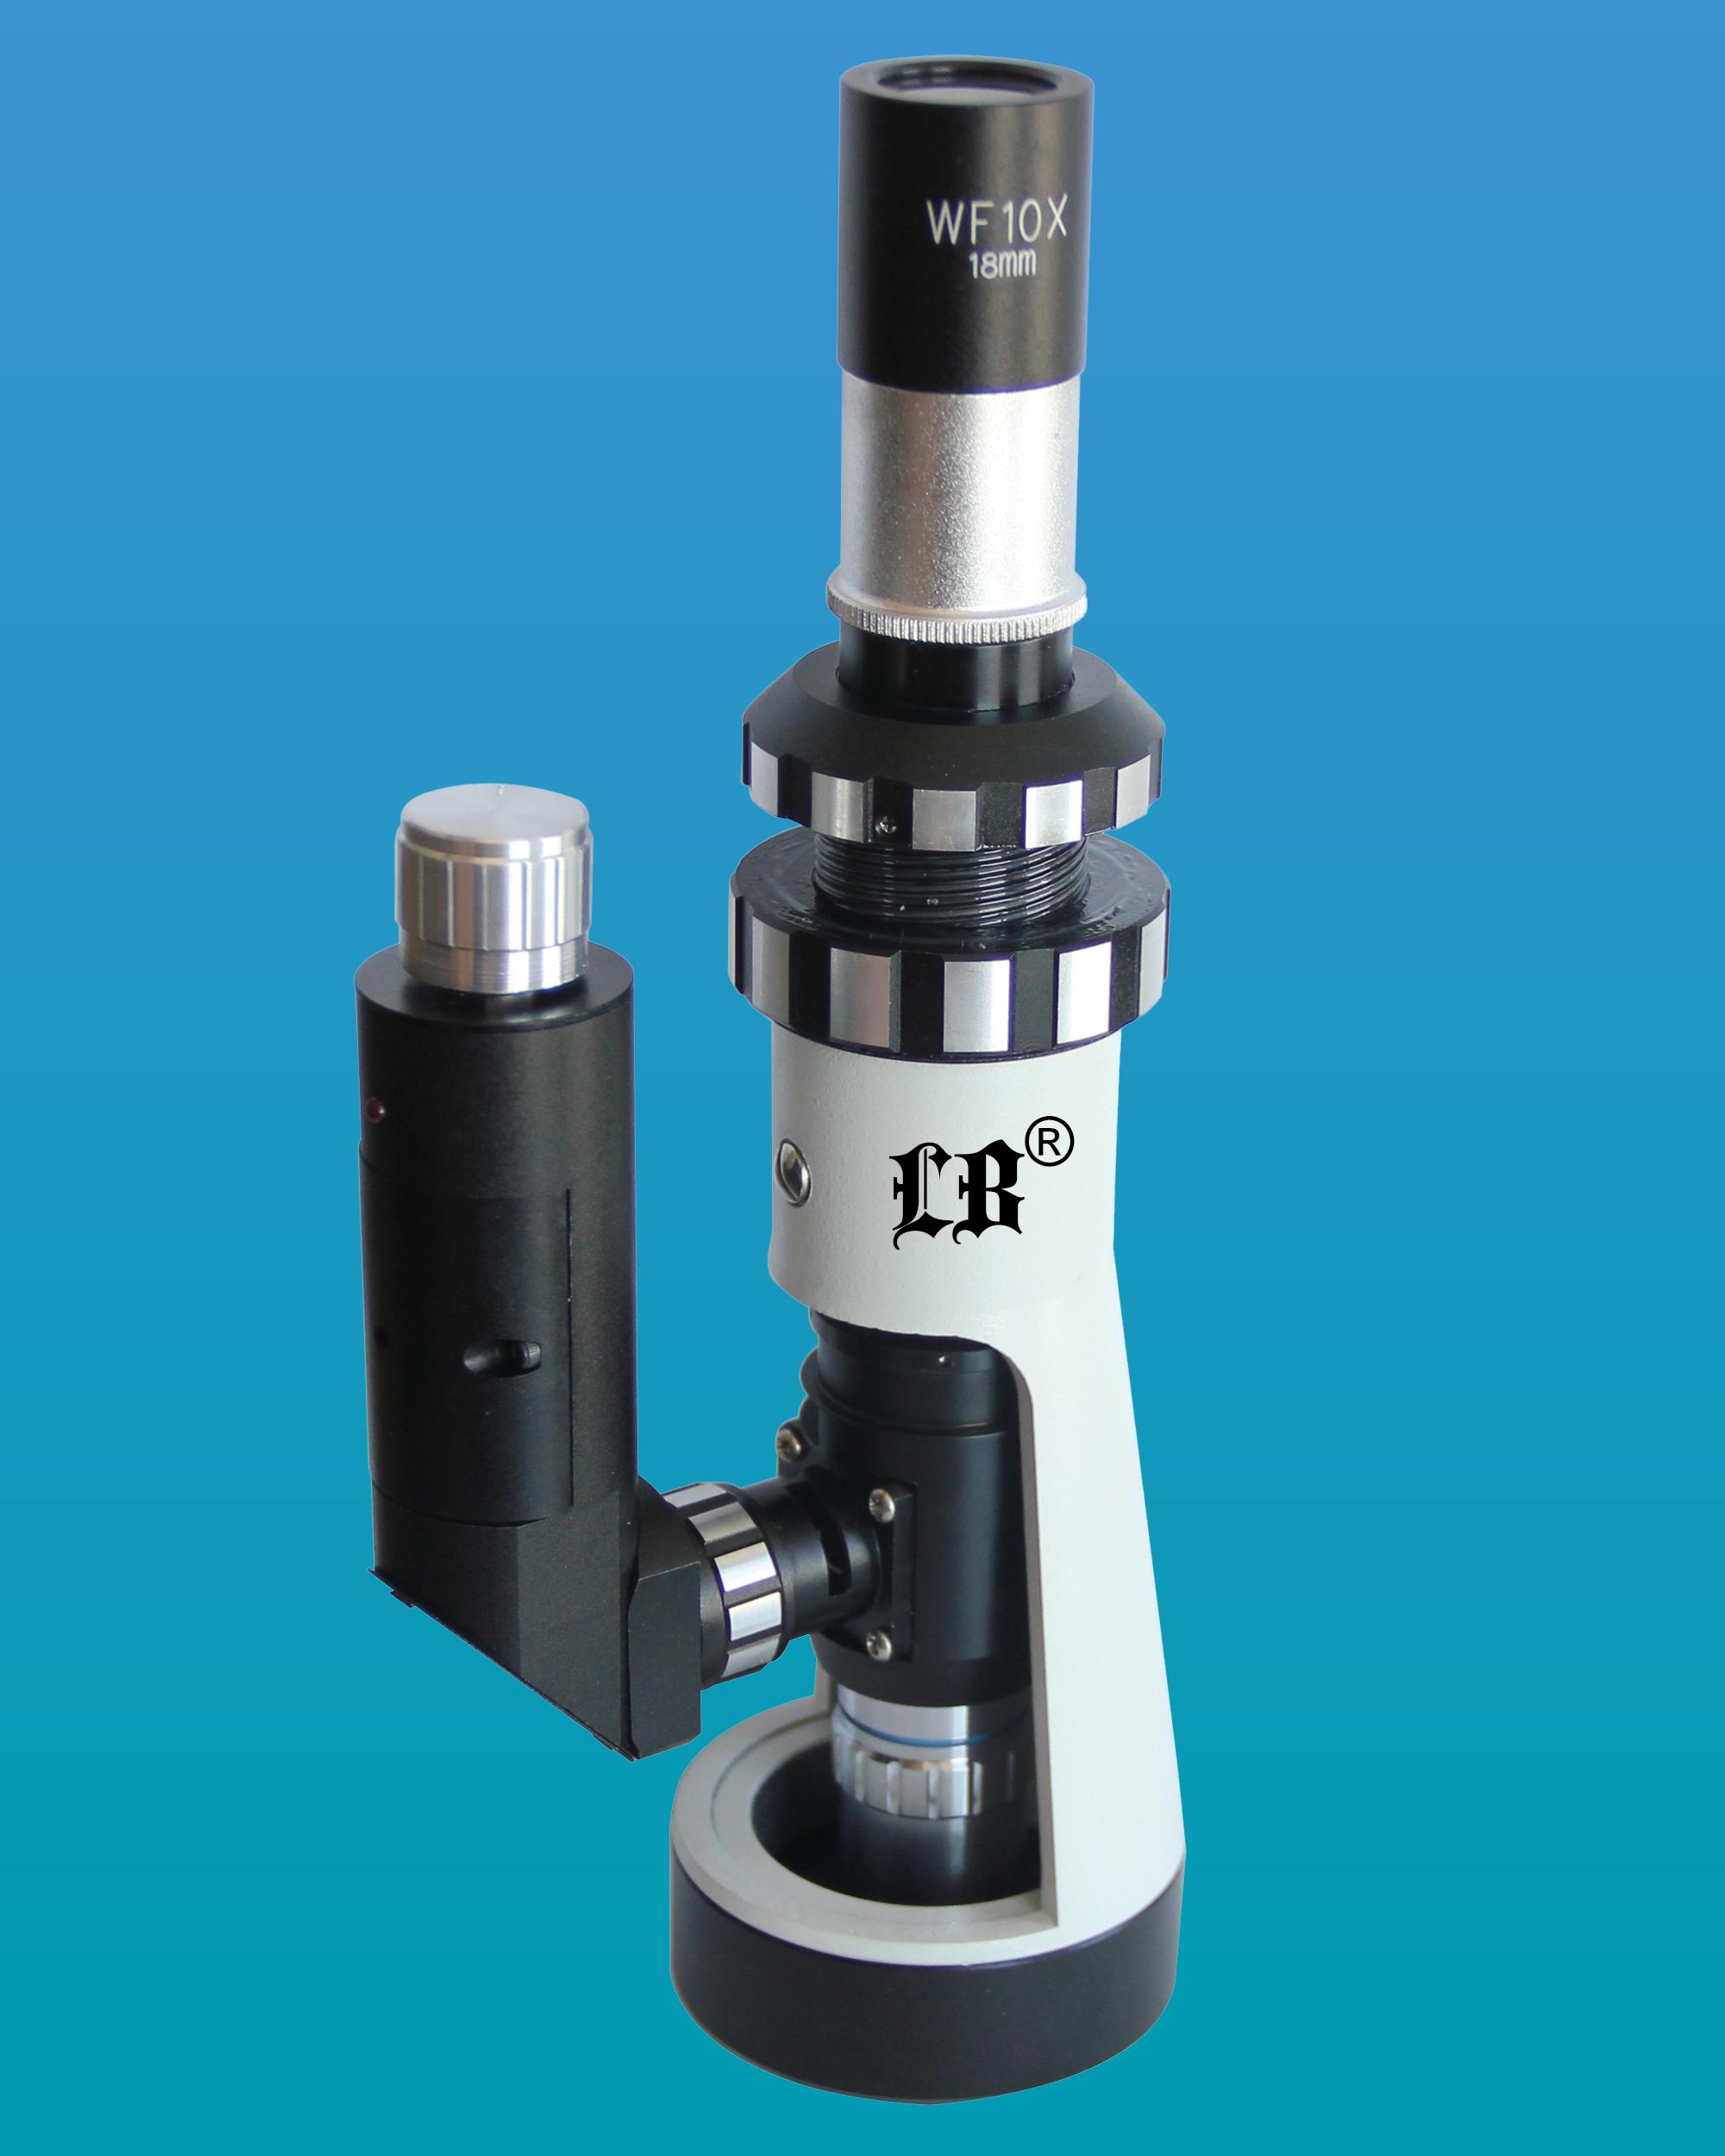 [LB-605] Portable Metallurgical Microscope